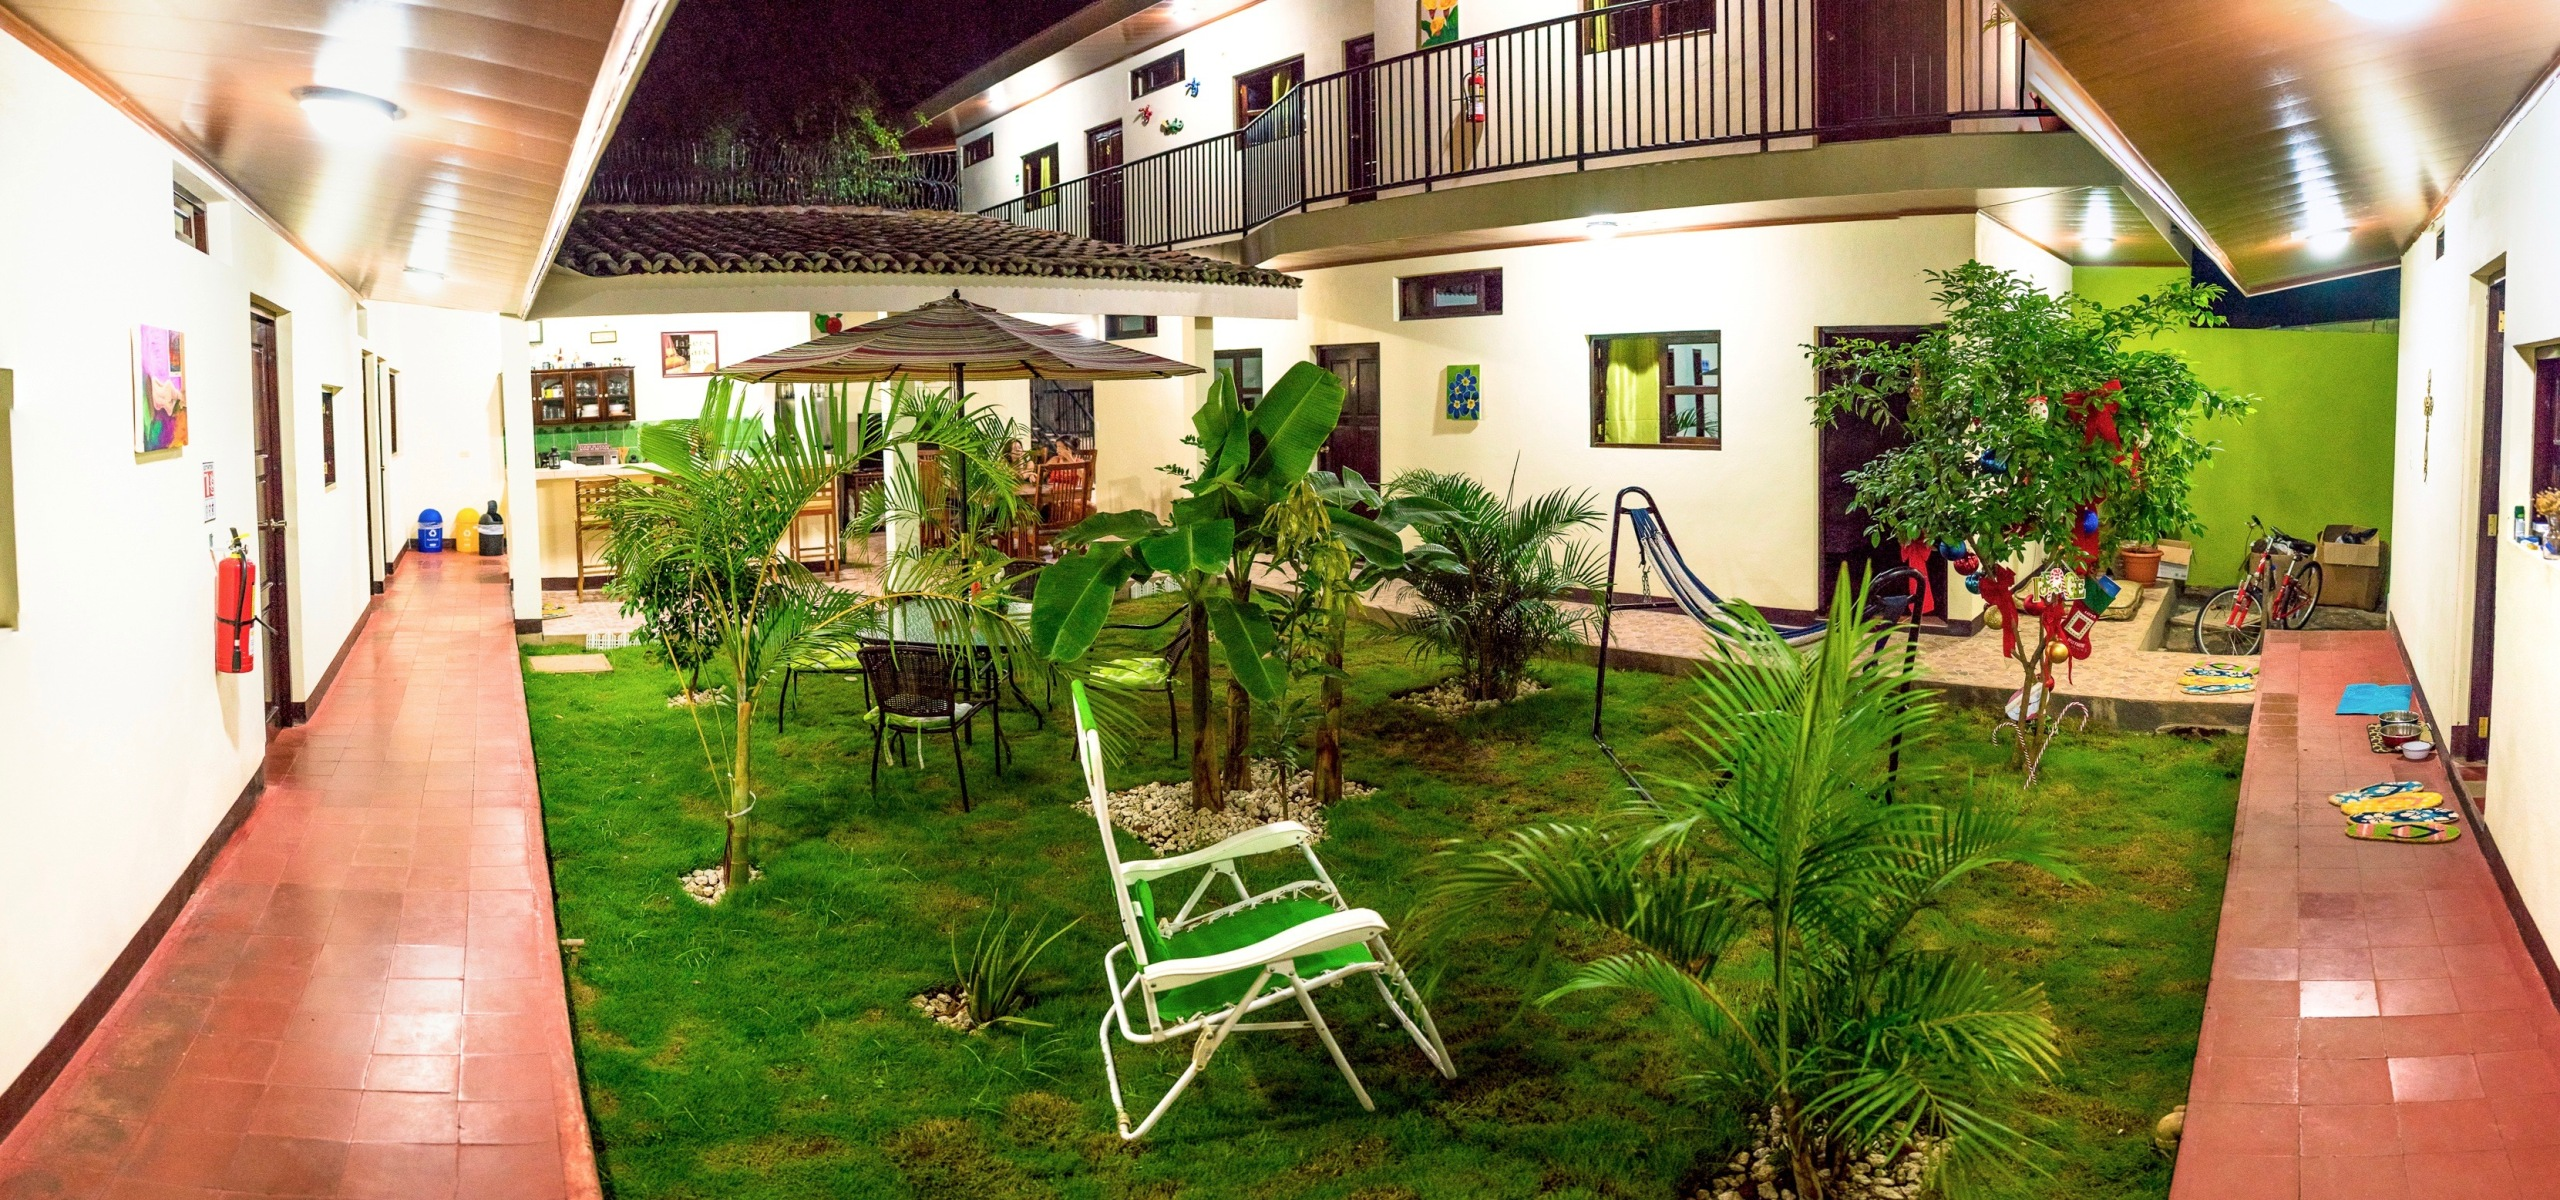 Nicaragua, expat, Leon, hostel, guesthouse, new grass, fruit trees, limes, mandarins, mango